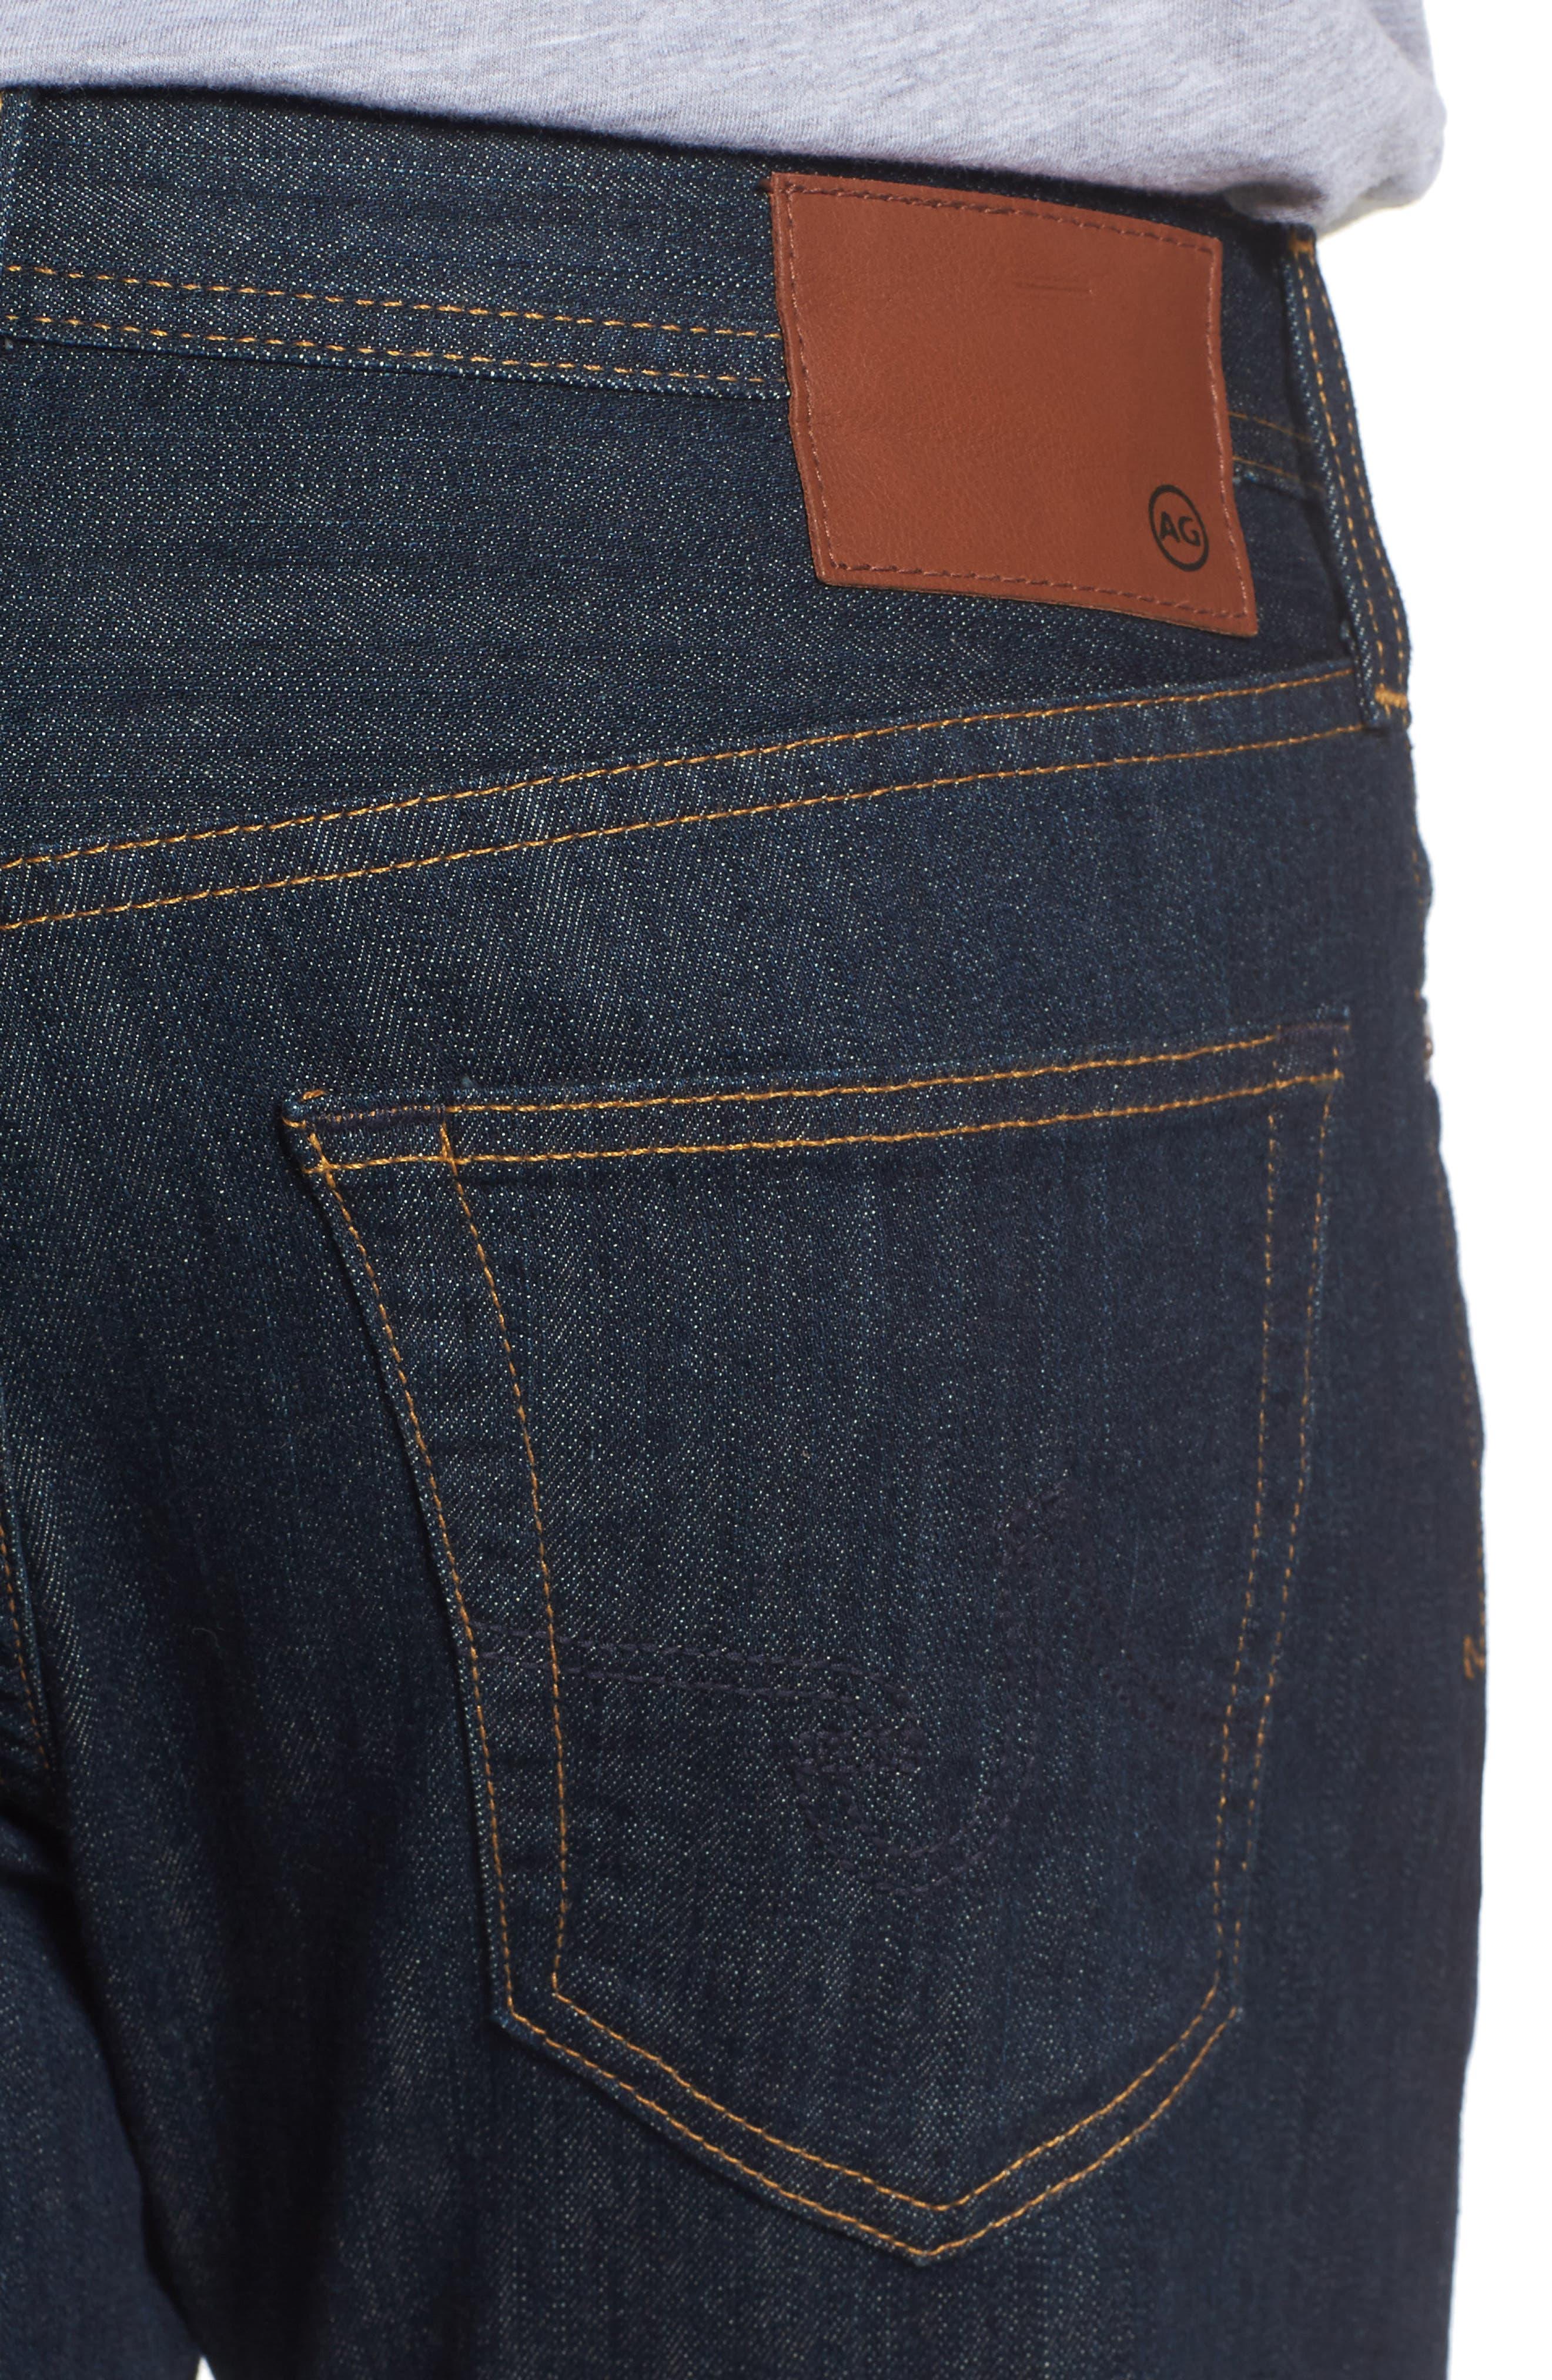 'Protégé' Straight Leg Jeans,                             Alternate thumbnail 4, color,                             016